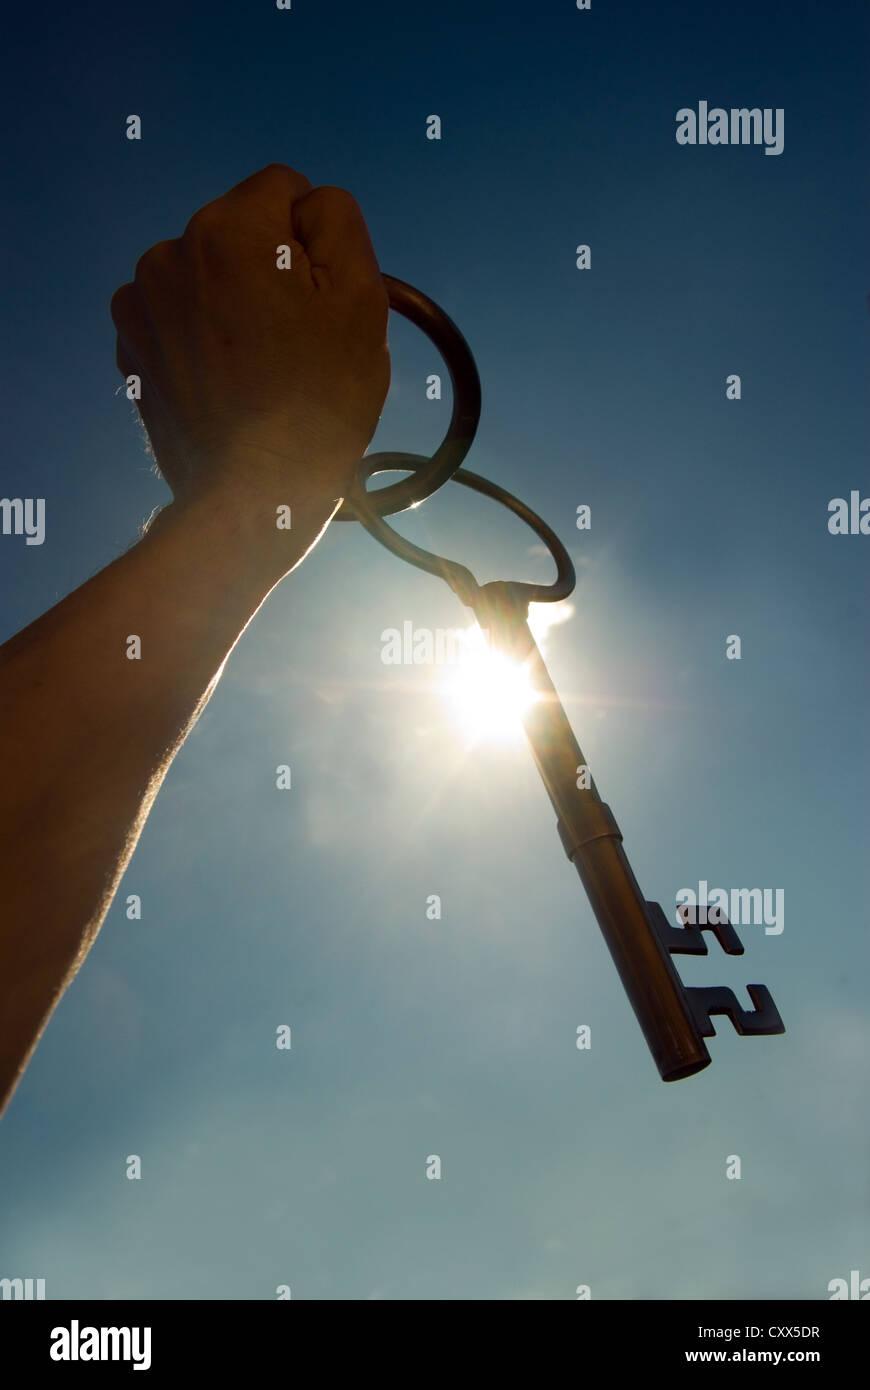 Hand Holding up large key.Freedom / Escape concept - Stock Image